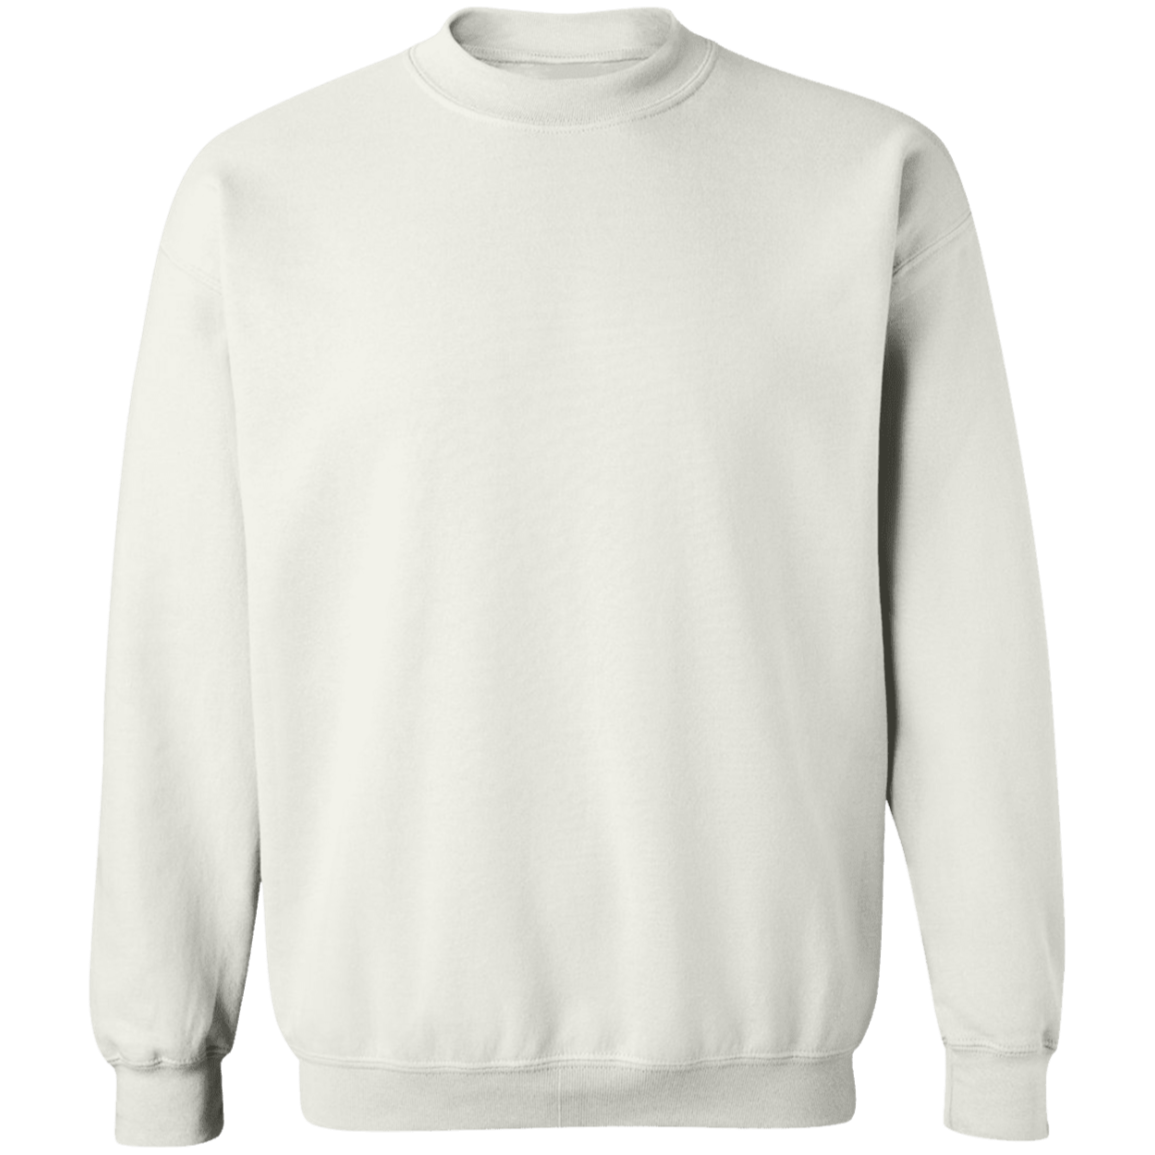 Adult Crewneck Pullover Sweatshirt 8 oz.